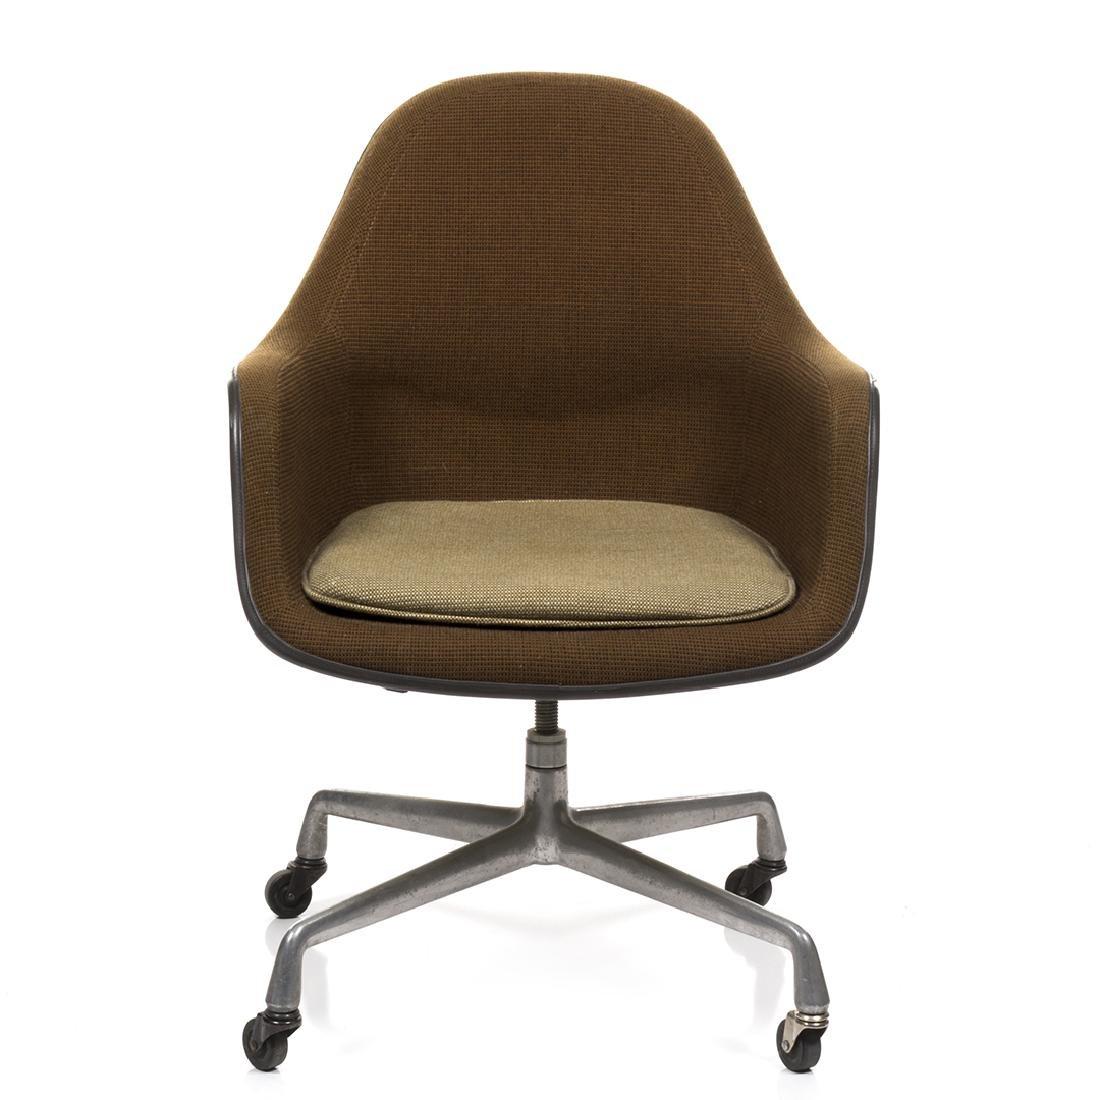 Charles Eames Executive Shell Chair - 2